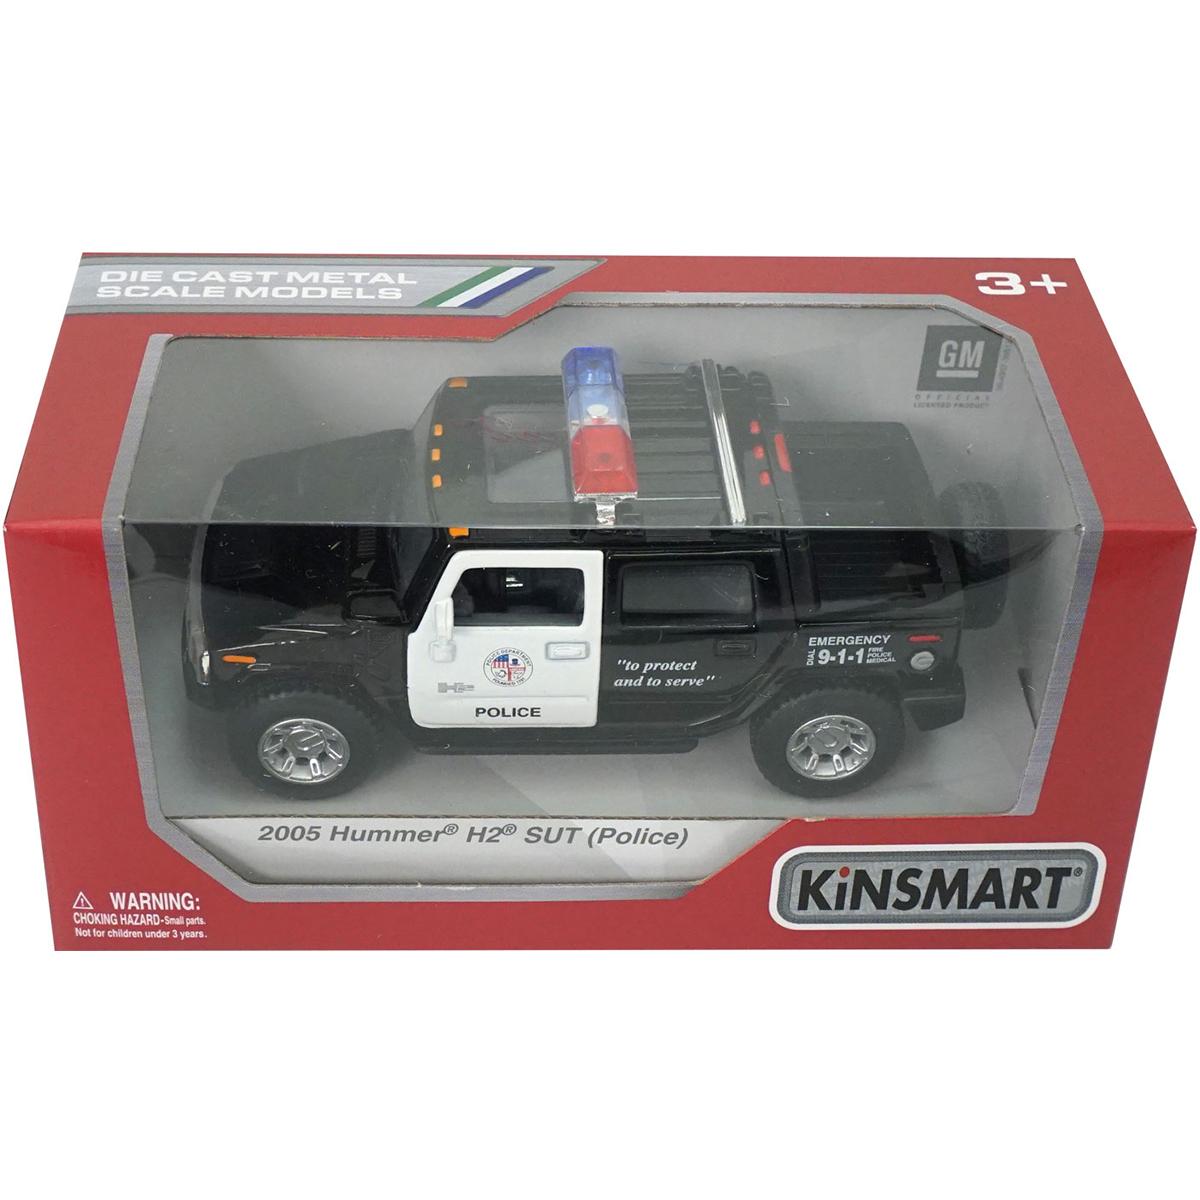 Masinuta metalica de politie Kinsmart, Hummer H2 2005